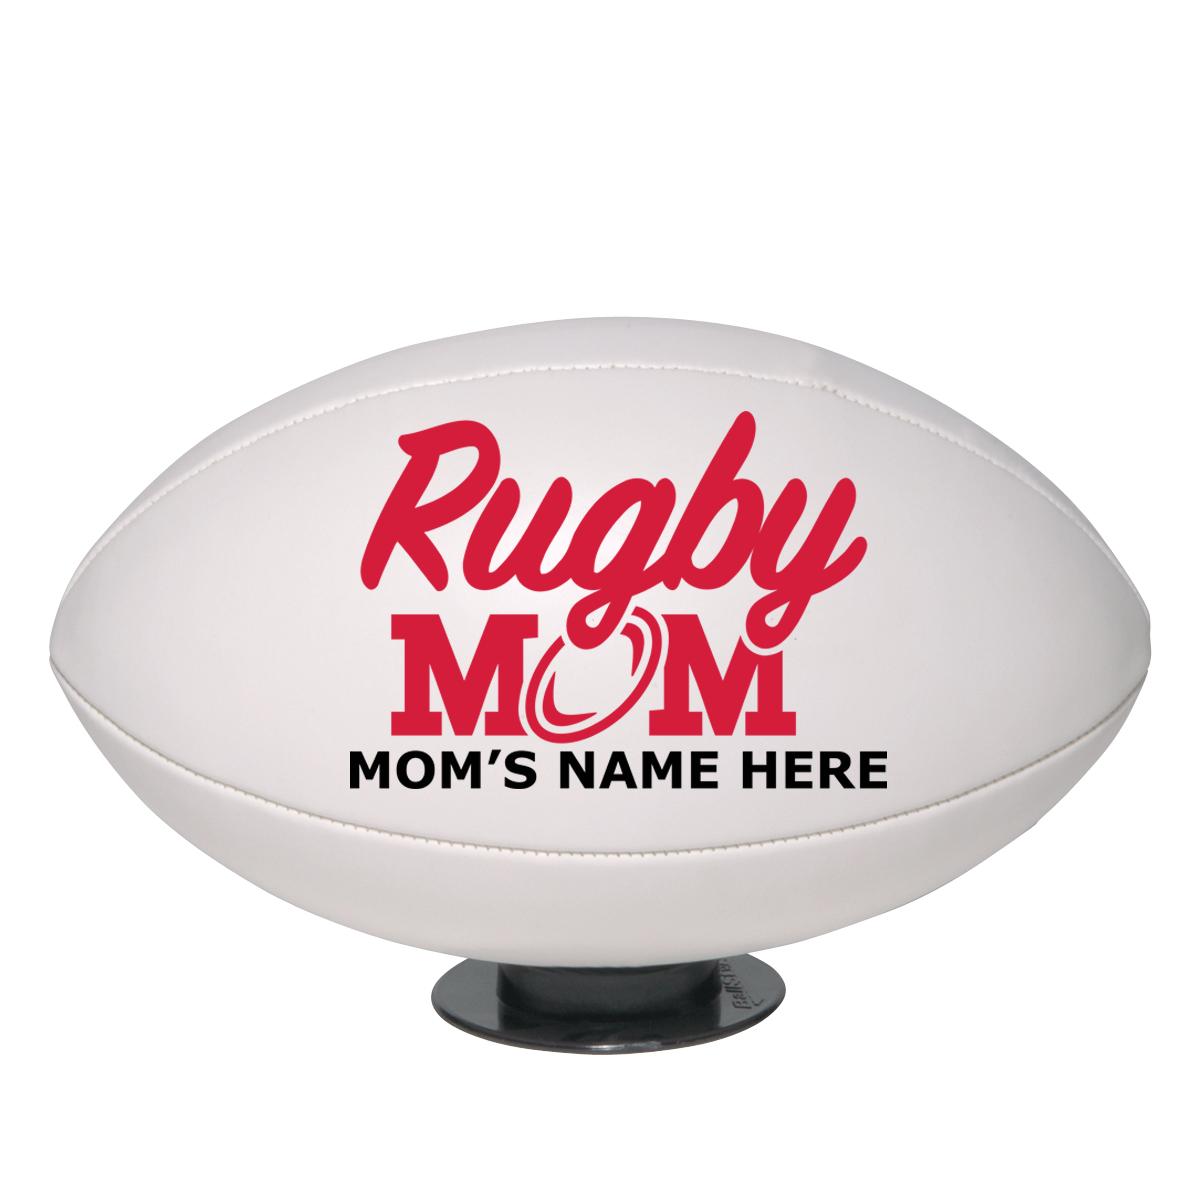 Rugby Mom Ball In 2020 Rugby Mom Rugby Ball Rugby